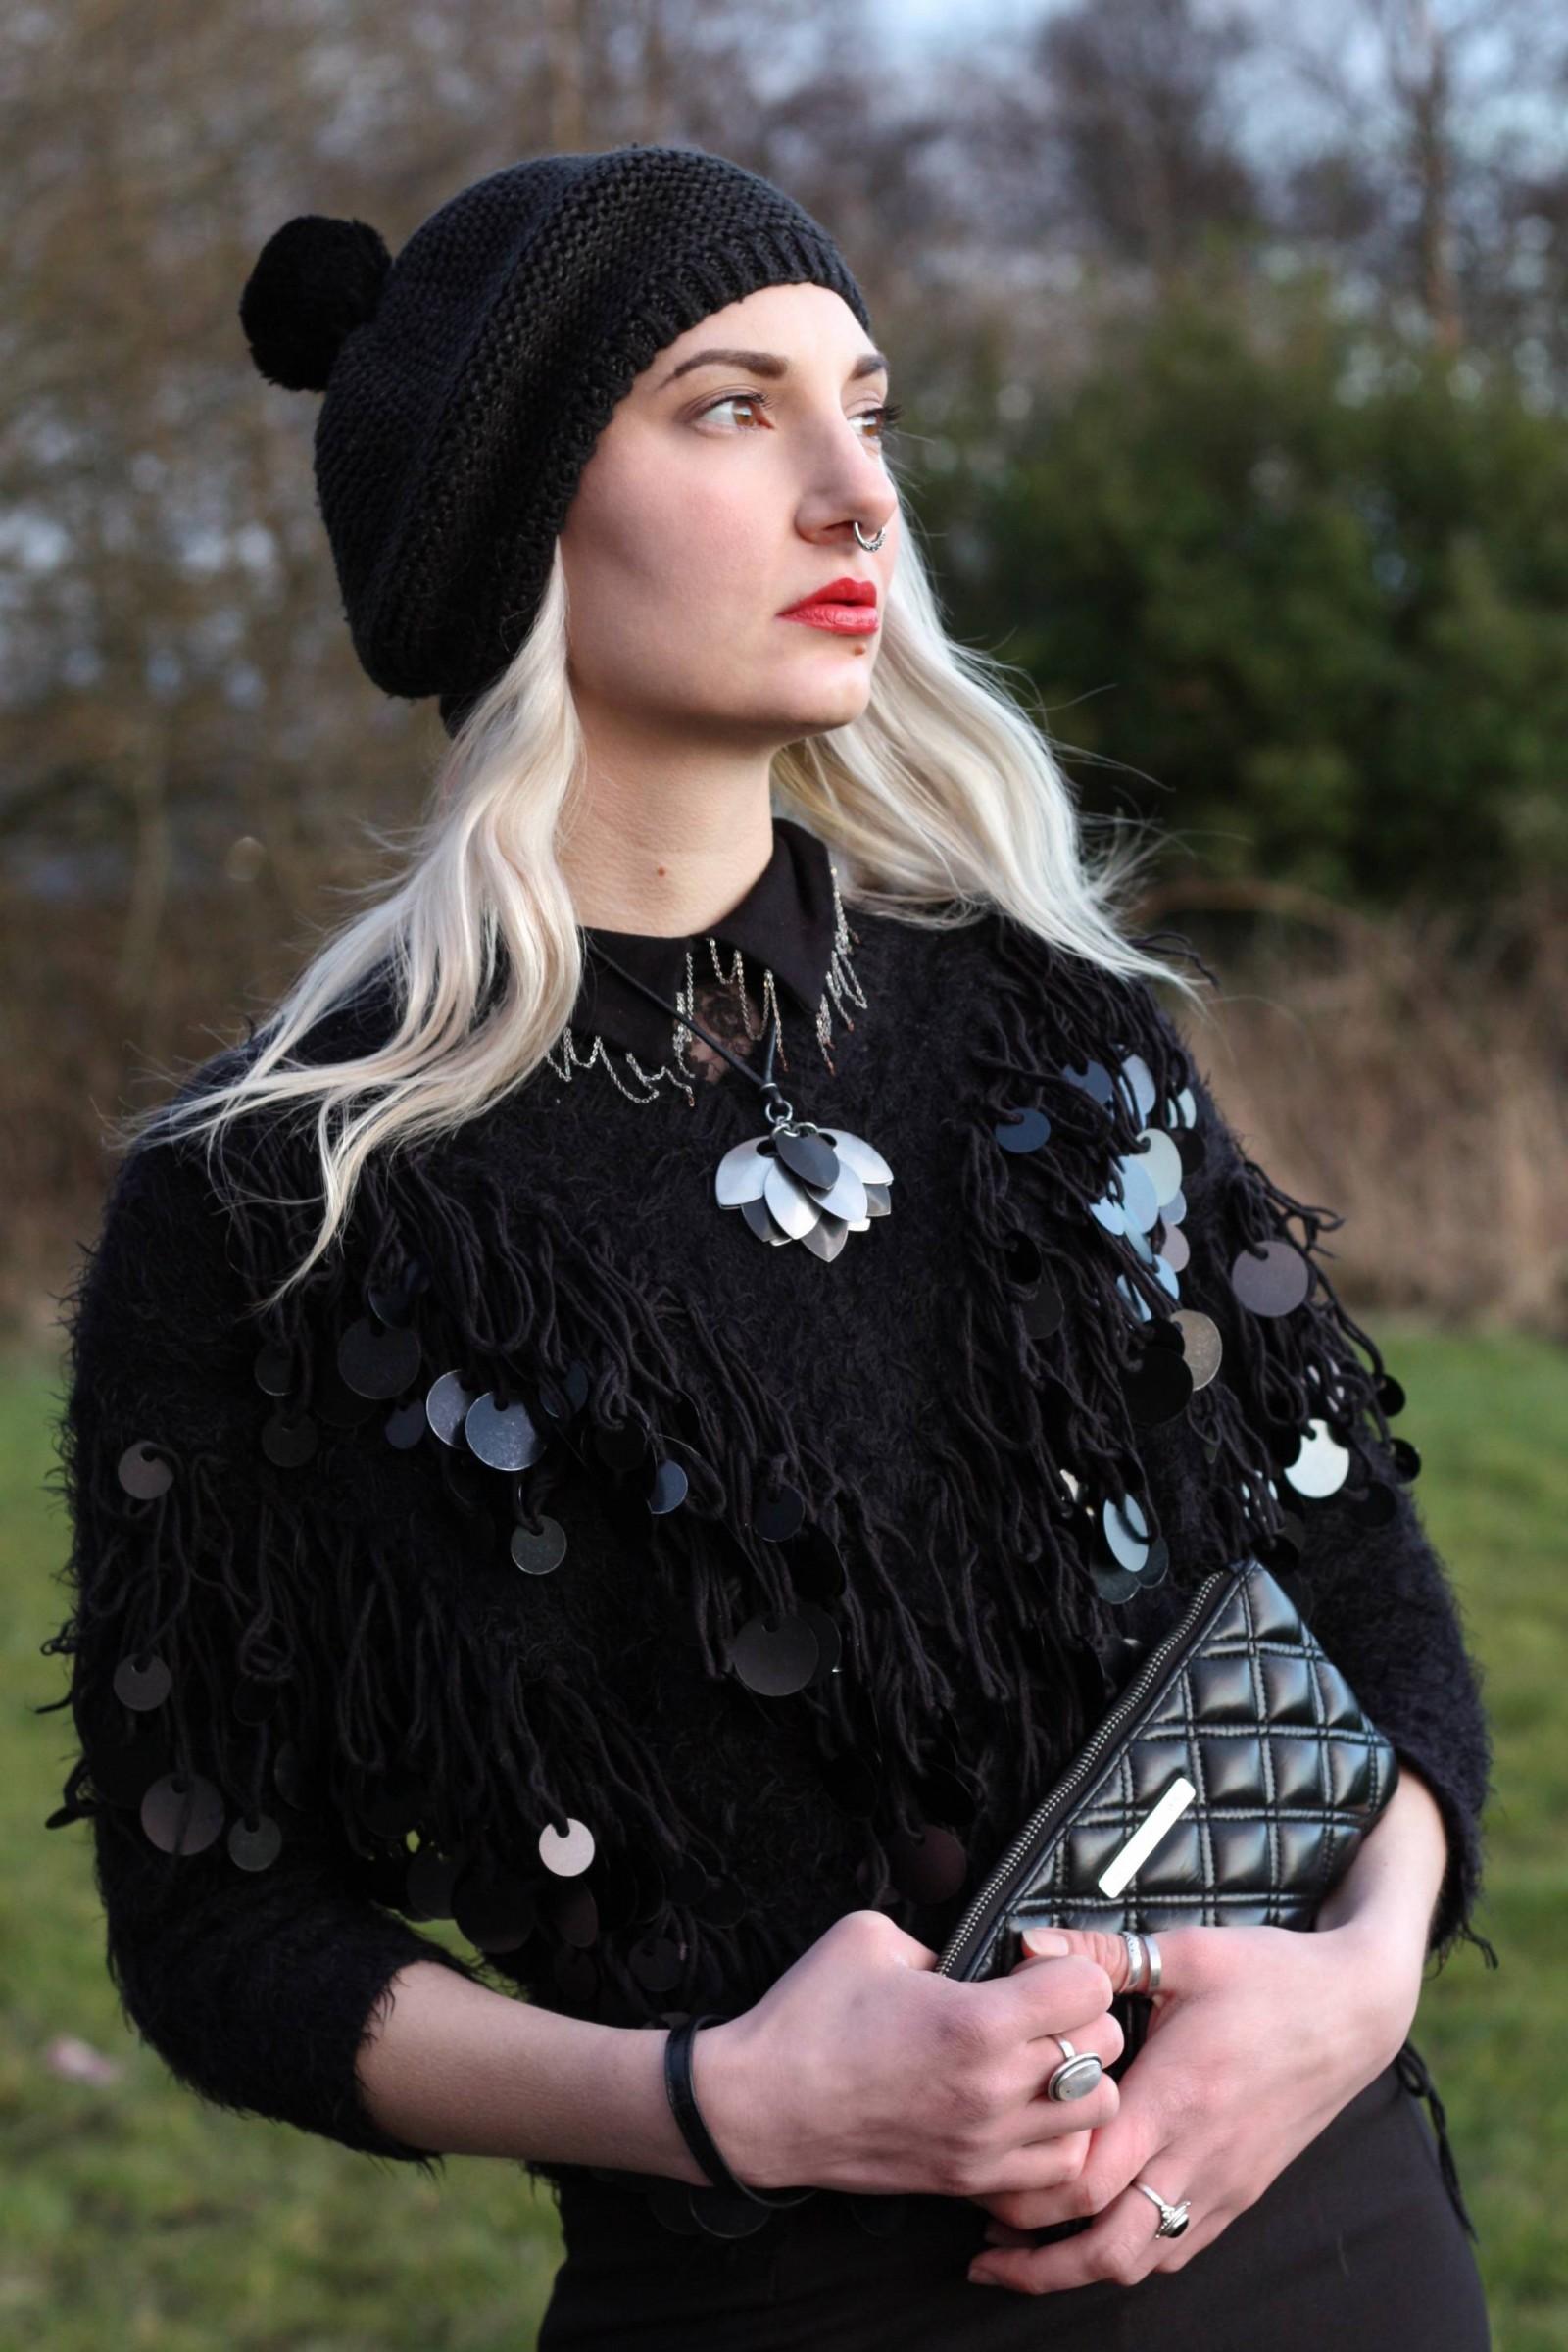 fashion blogger textured juper, arc jacobs clutch sunset 4